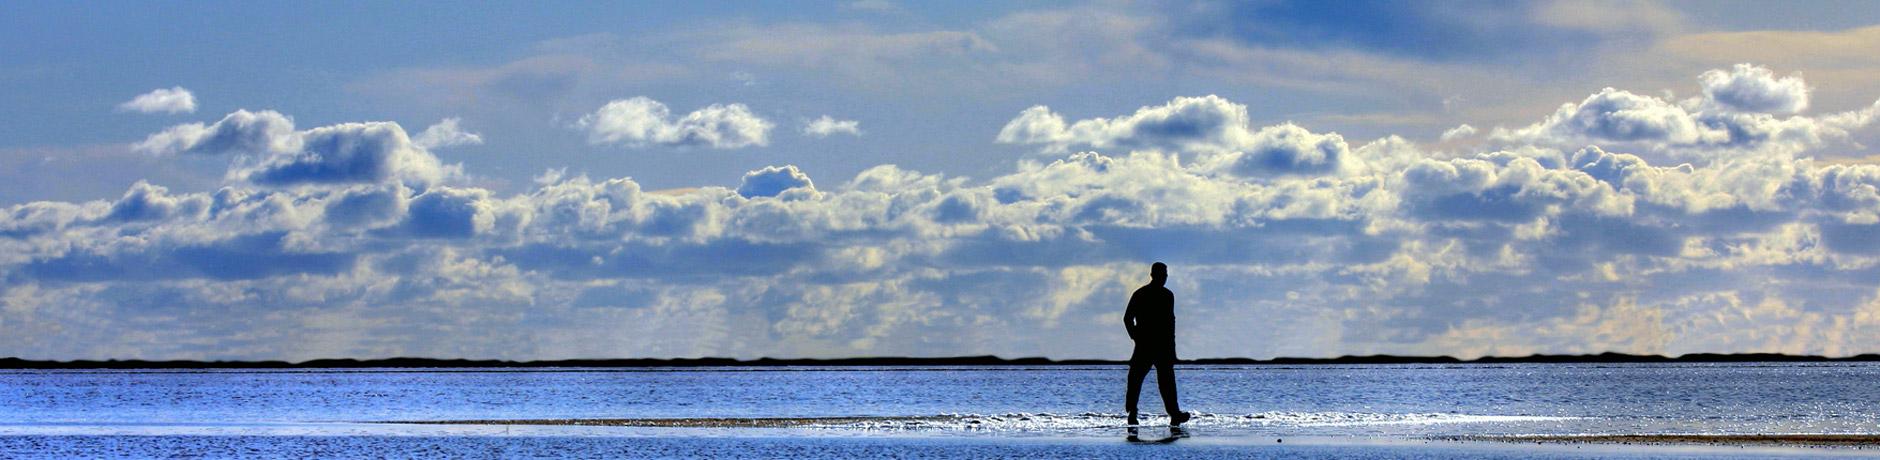 Atemtechnik - richtig Atmen wir hier am Meer